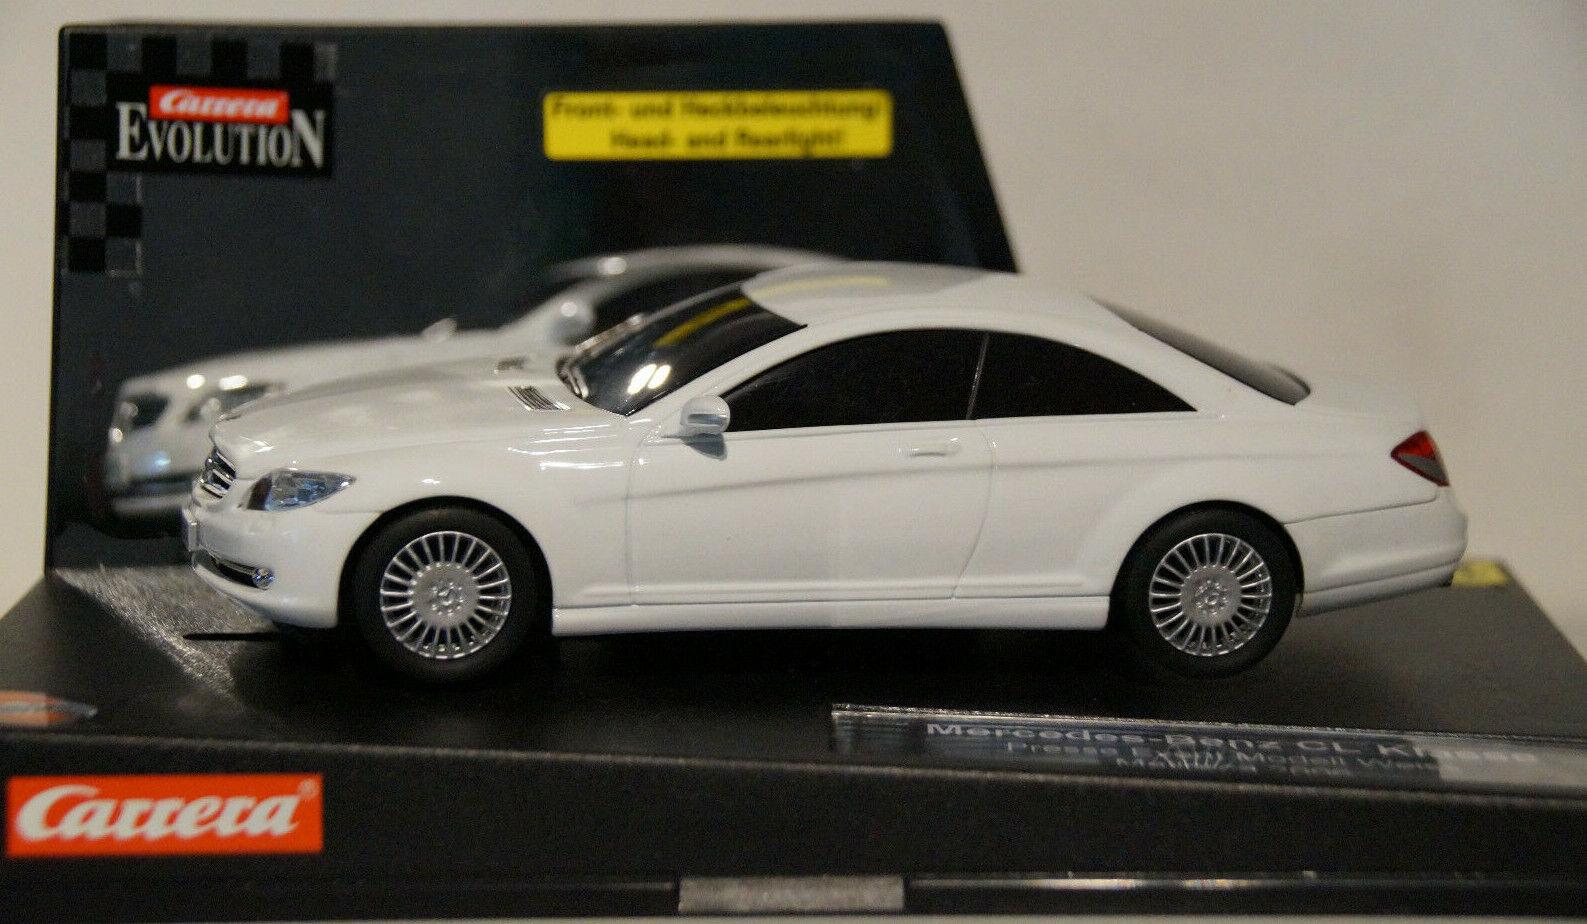 Carrera Evolution Nr. 25798 D Mercedes-Benz CL weiß Event Car 1 von 25 Stk. NEU